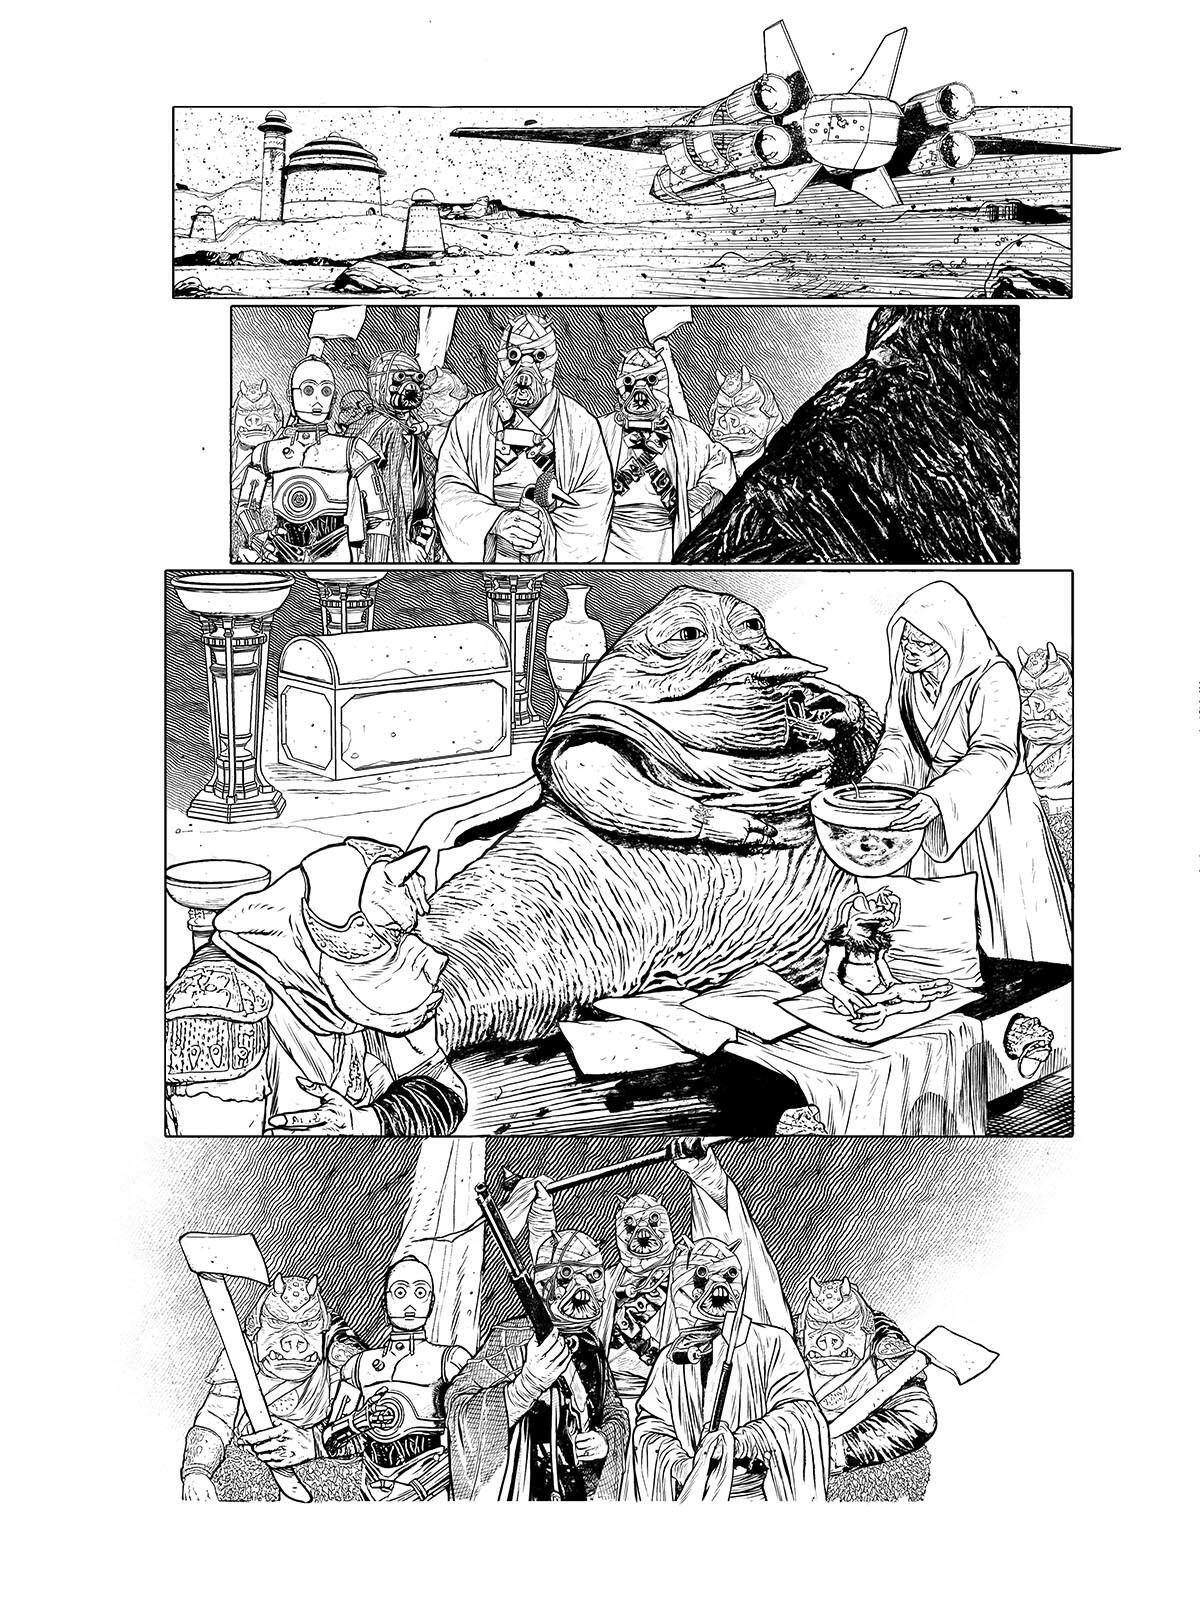 Star Wars: Age Of Rebellion - Jabba The Hutt (2019) #1